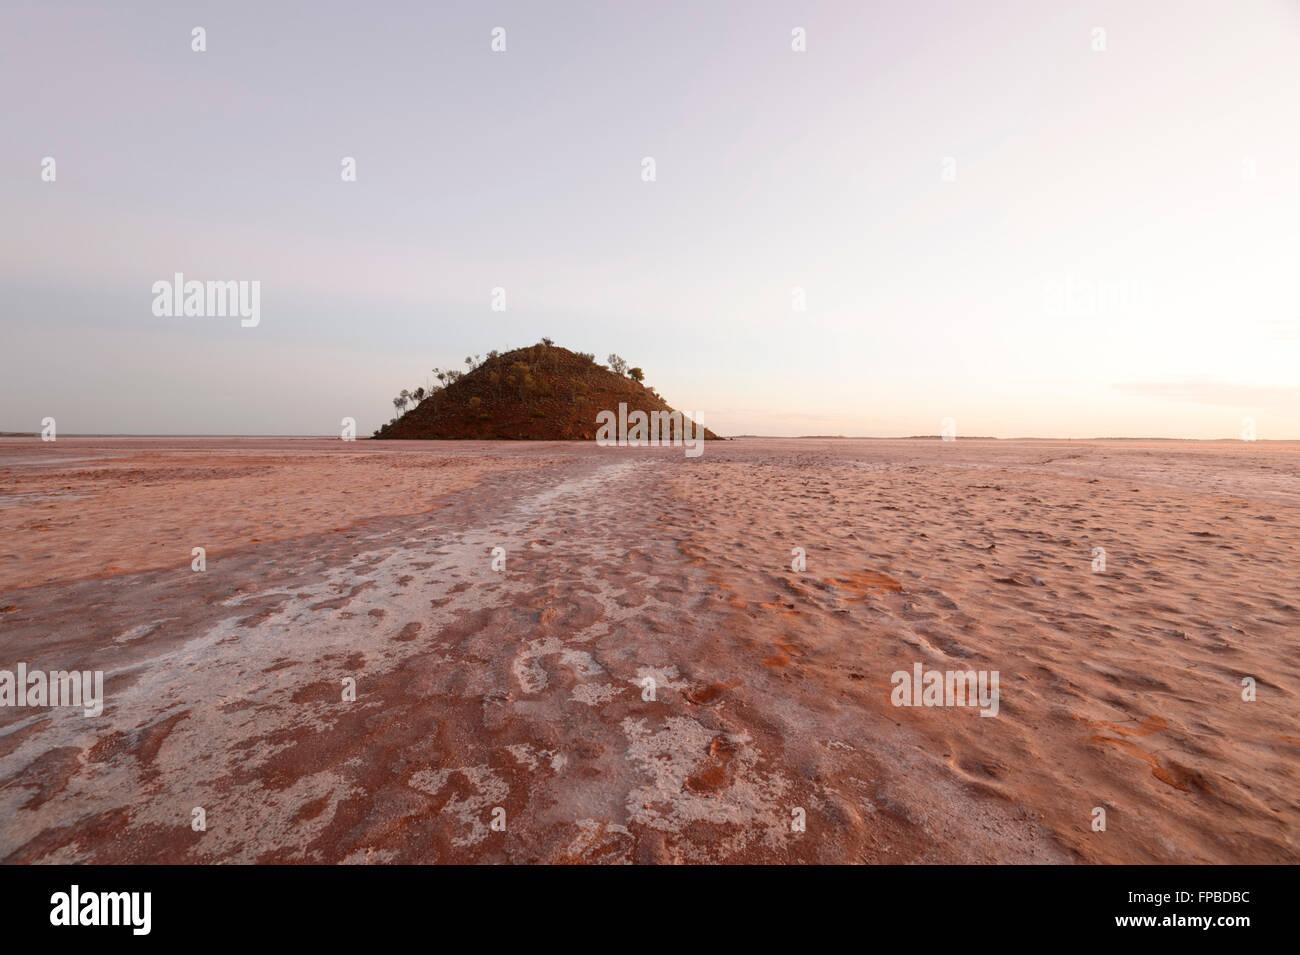 Lake Ballard, Western Australia, WA, Australia - Stock Image